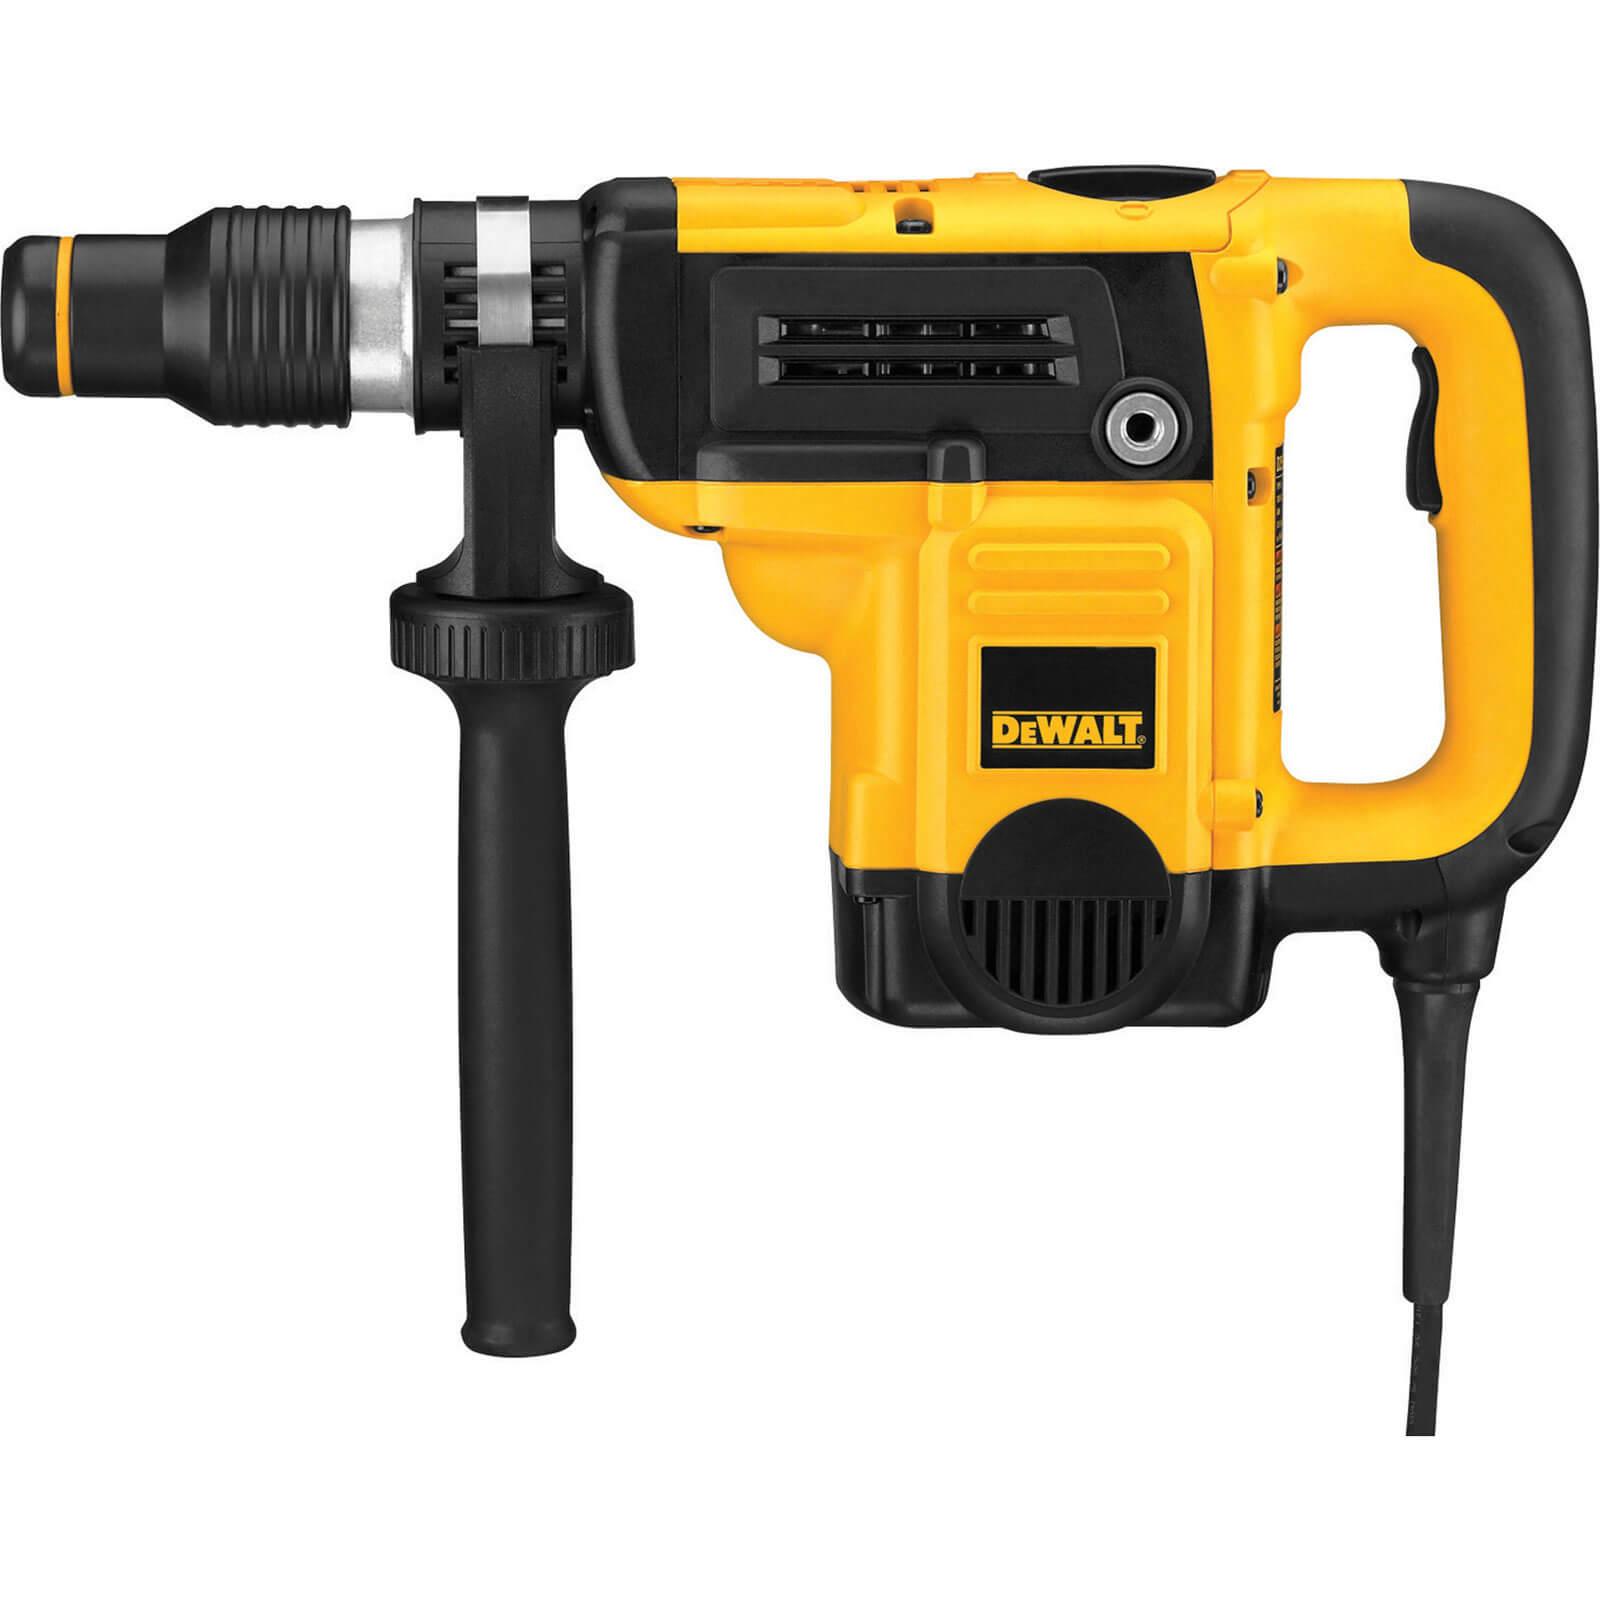 DeWalt D25501K 5 Kilo SDS Max Combi Drill 1100w 110v